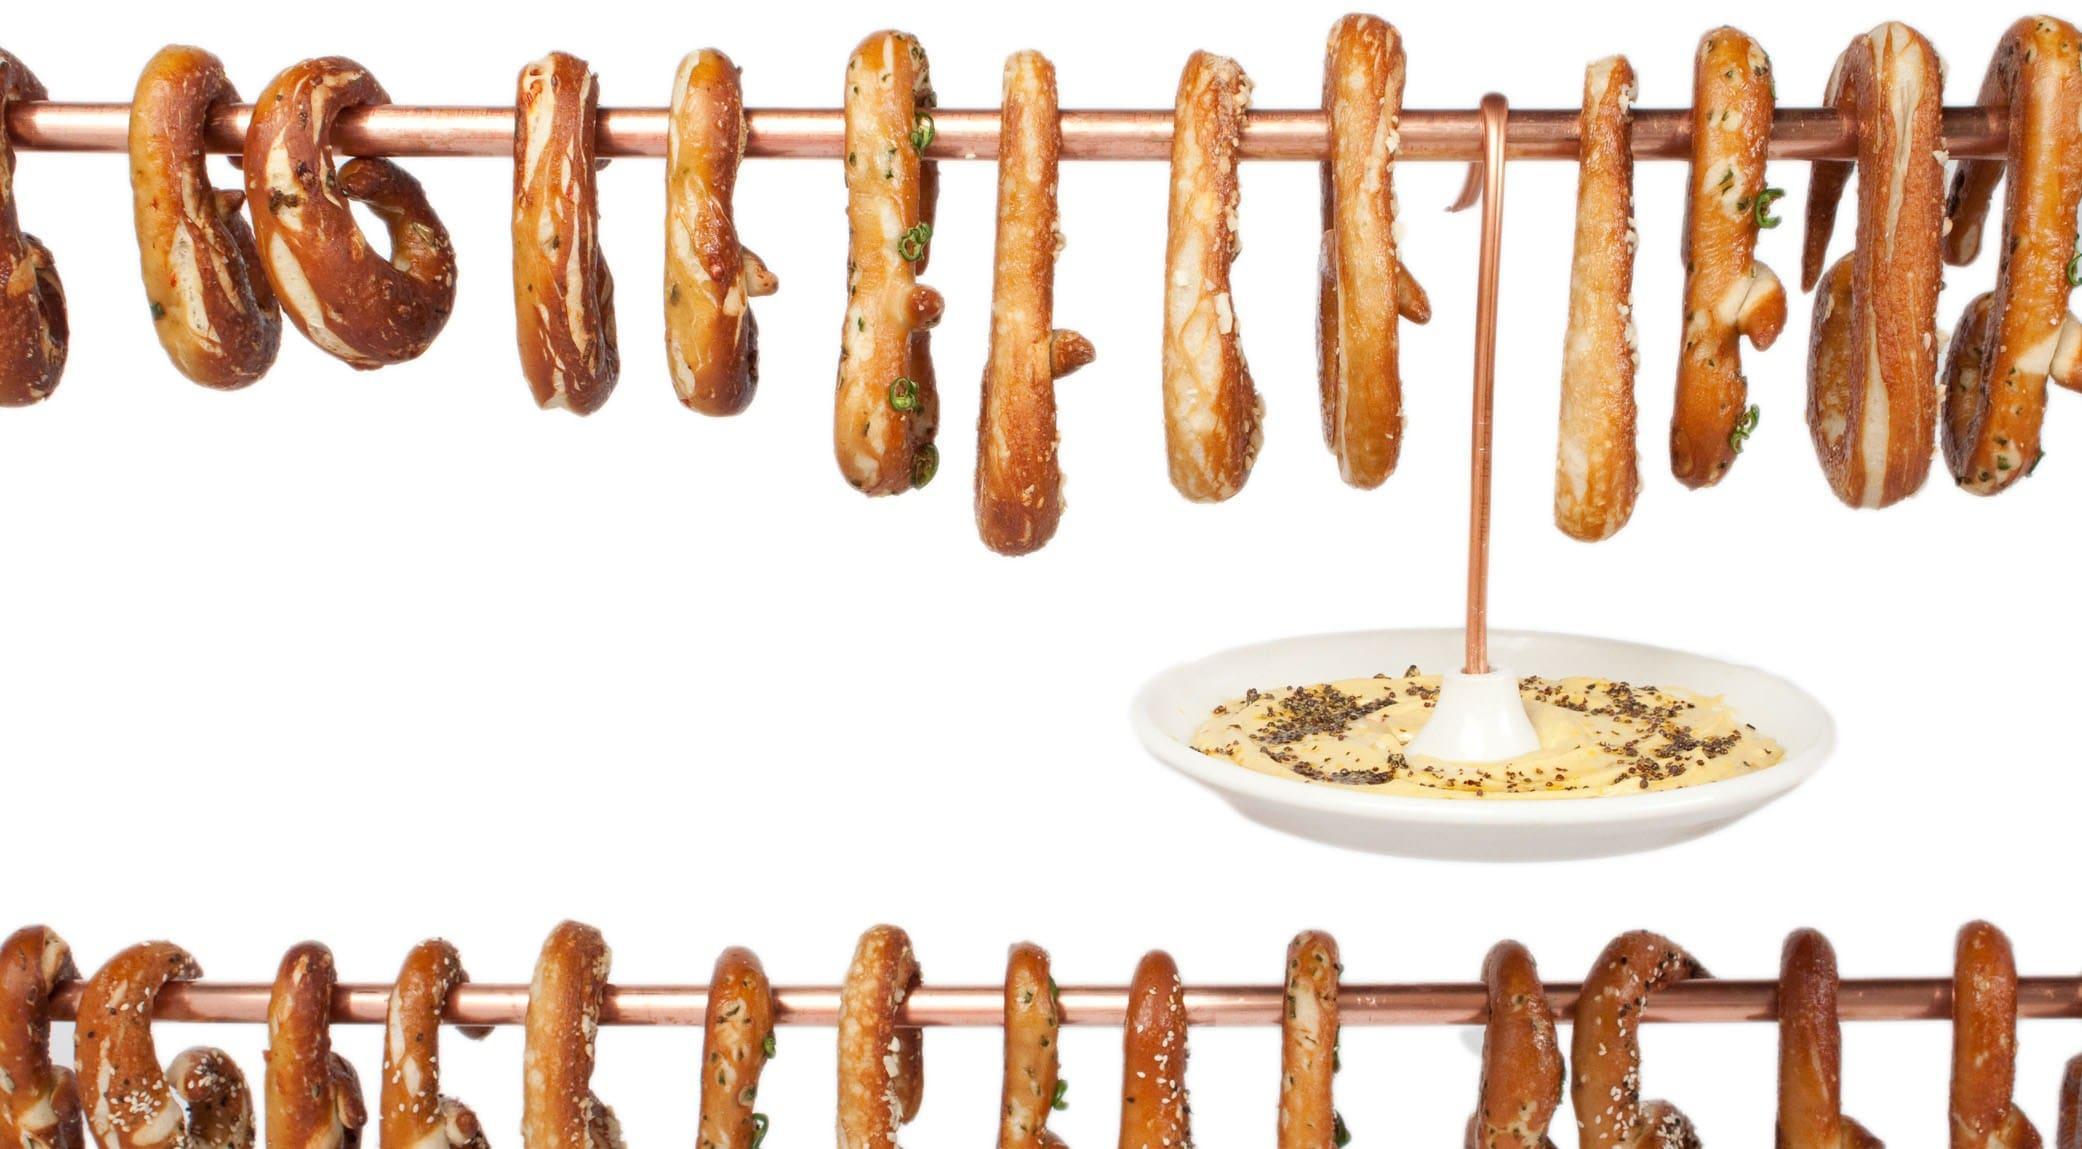 original_PopUp-suspension-pretzels-.jpg